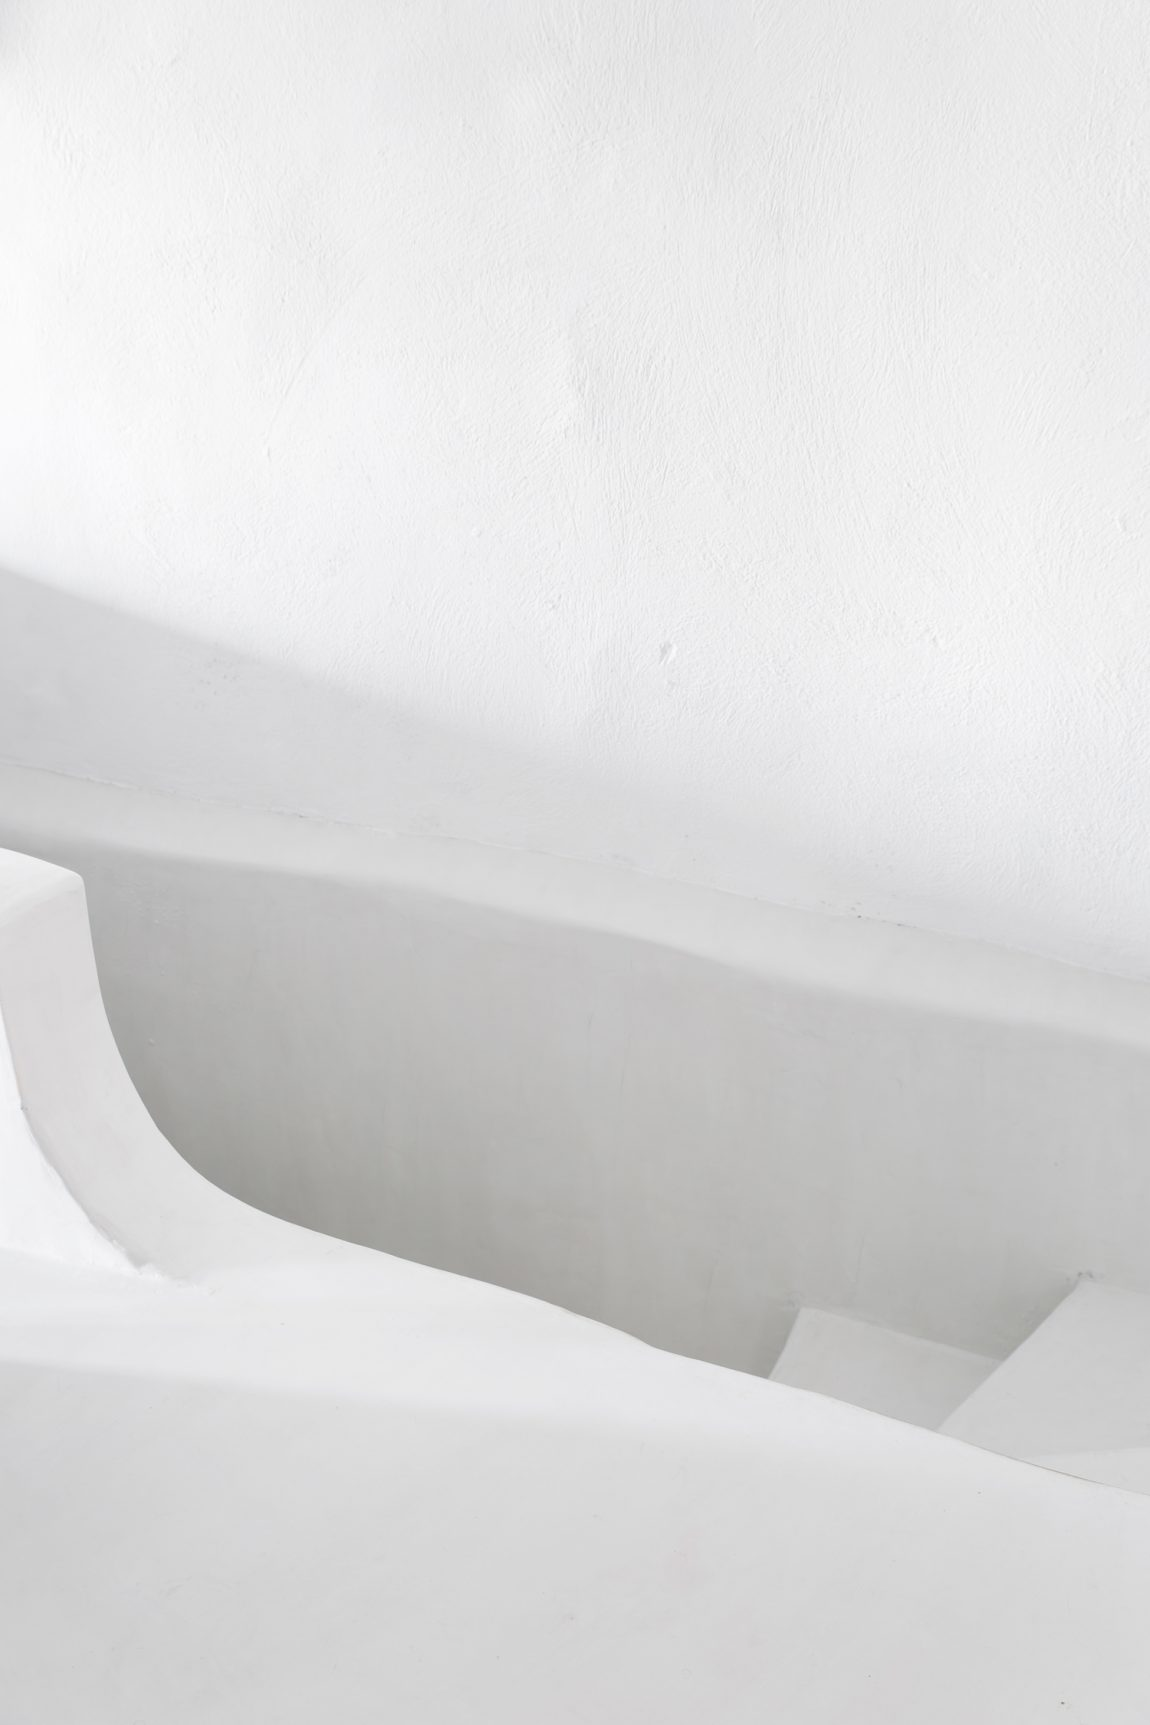 wit-gekalkte-muren-sophia-suites